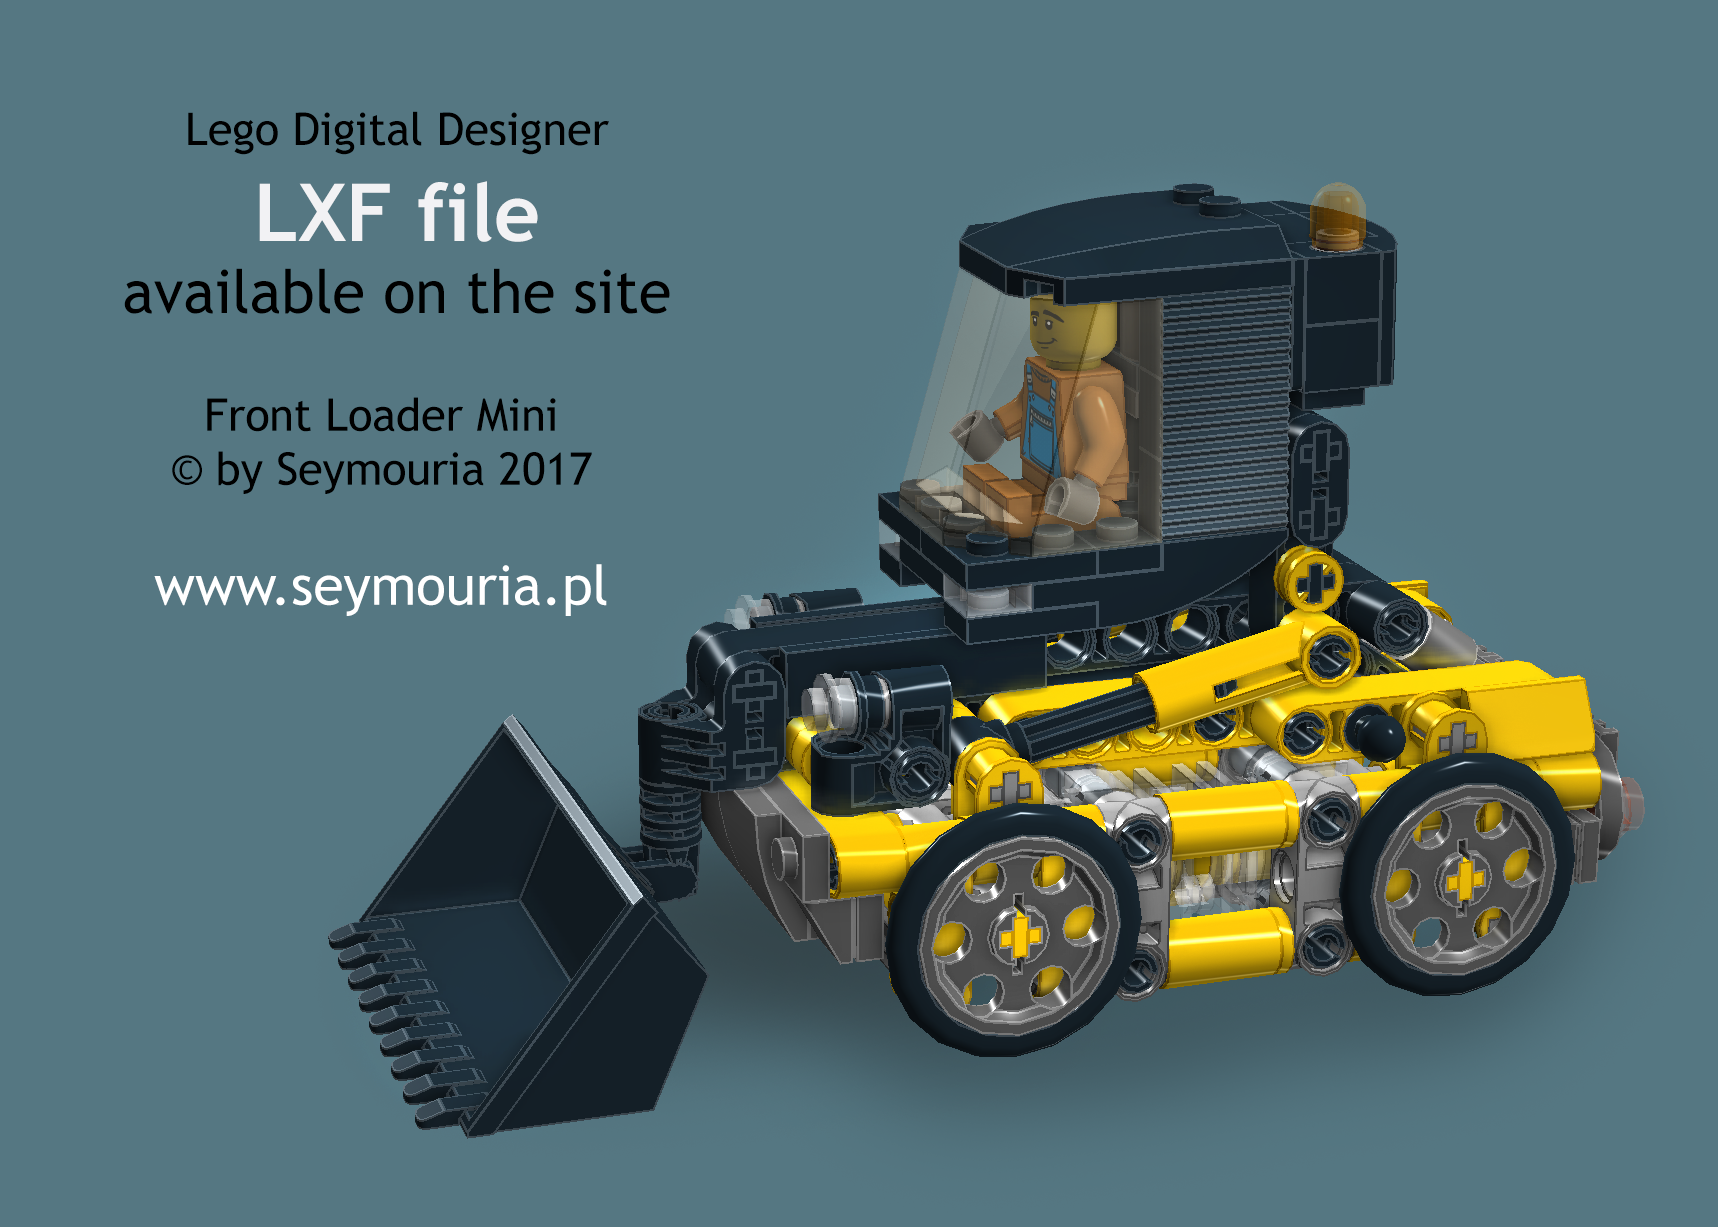 Front Loader Mini by Seymouria pl 2017 LXF file Lego Digital